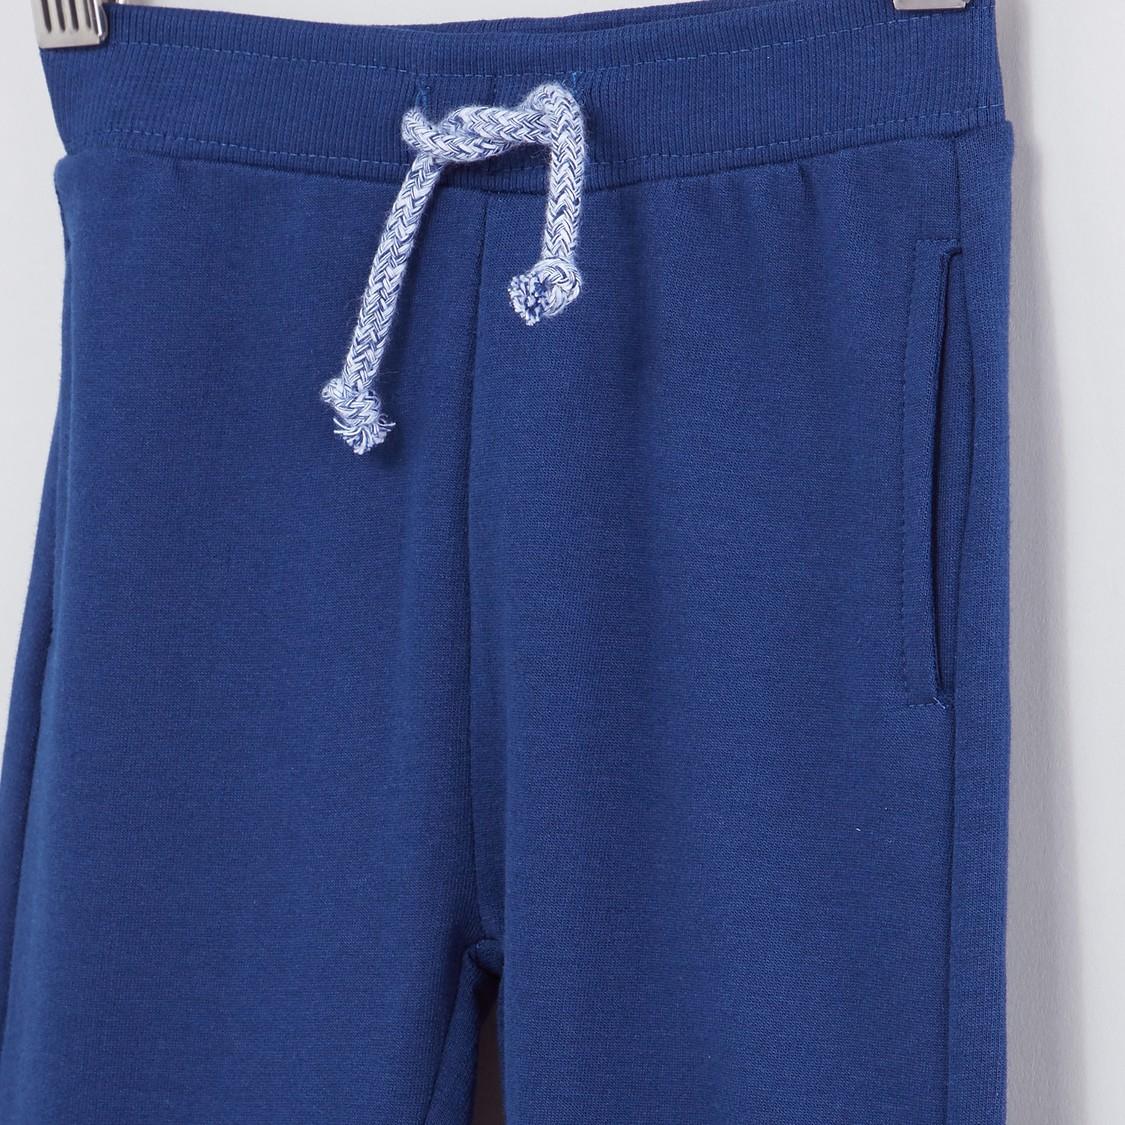 Jog Pants with Pocket Detail and Drawstring